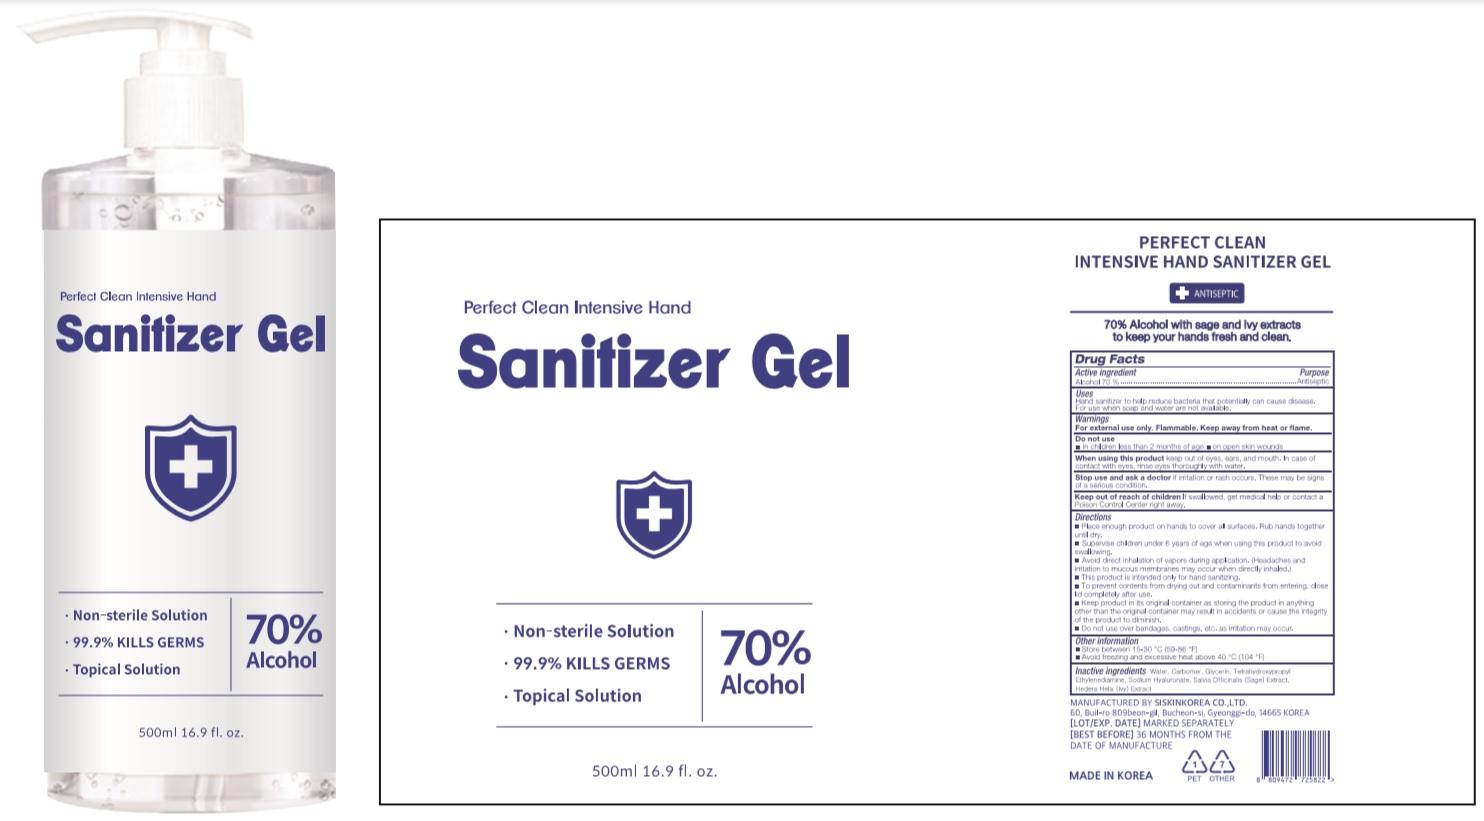 PERFECT CLEAN Intensive Hand Sanitizer Gel